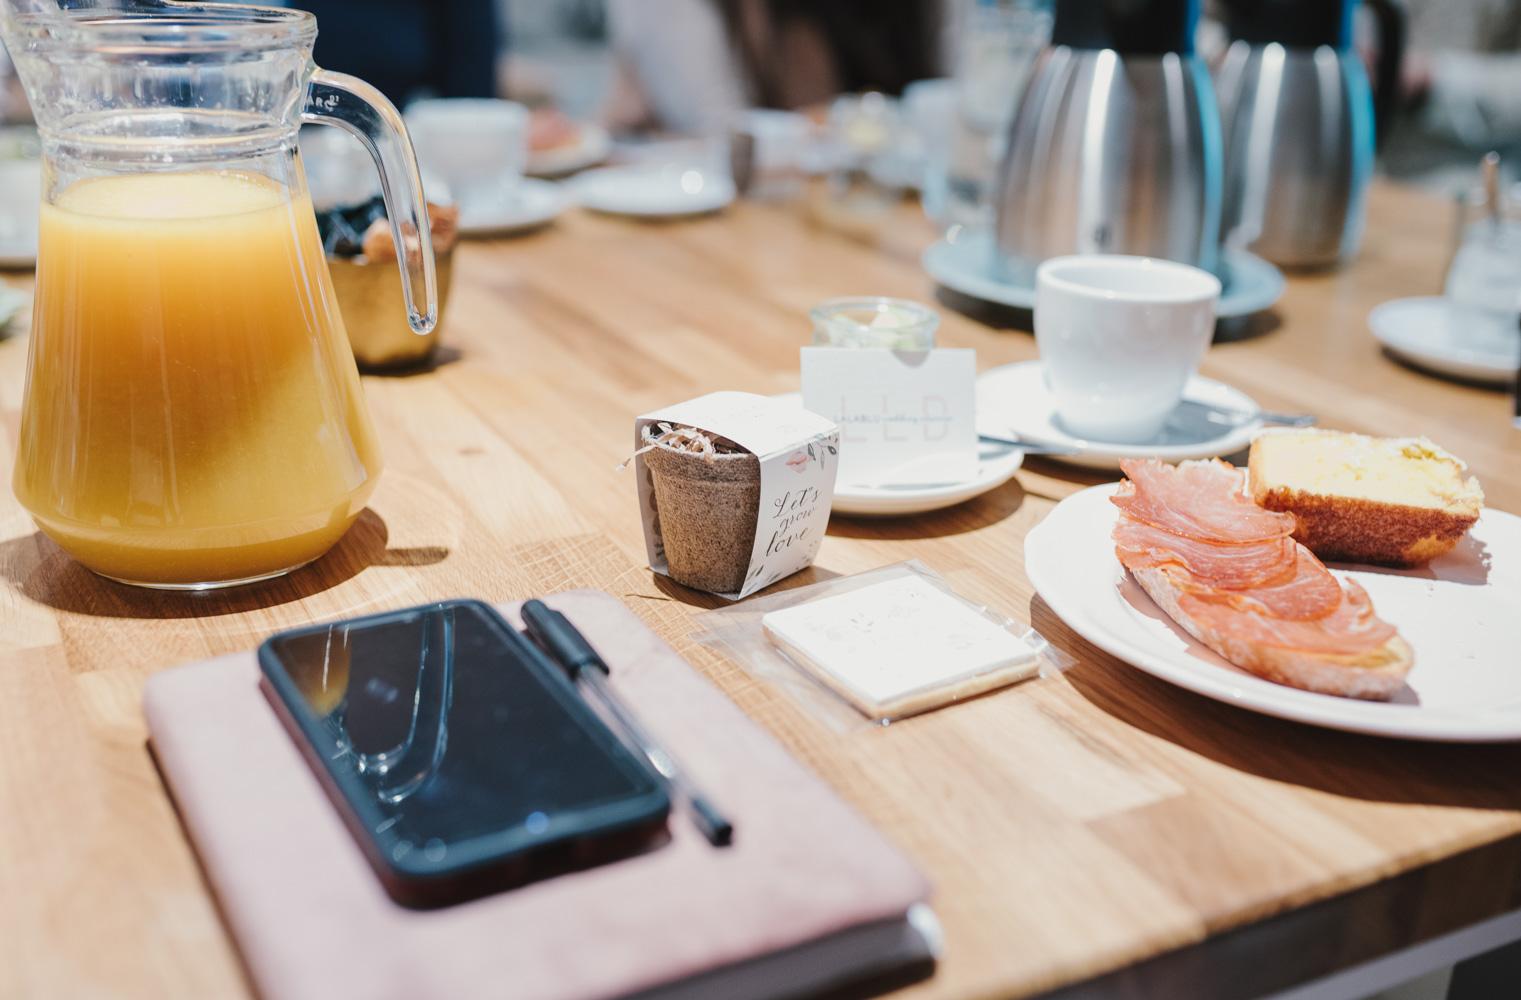 desayuno lalablu